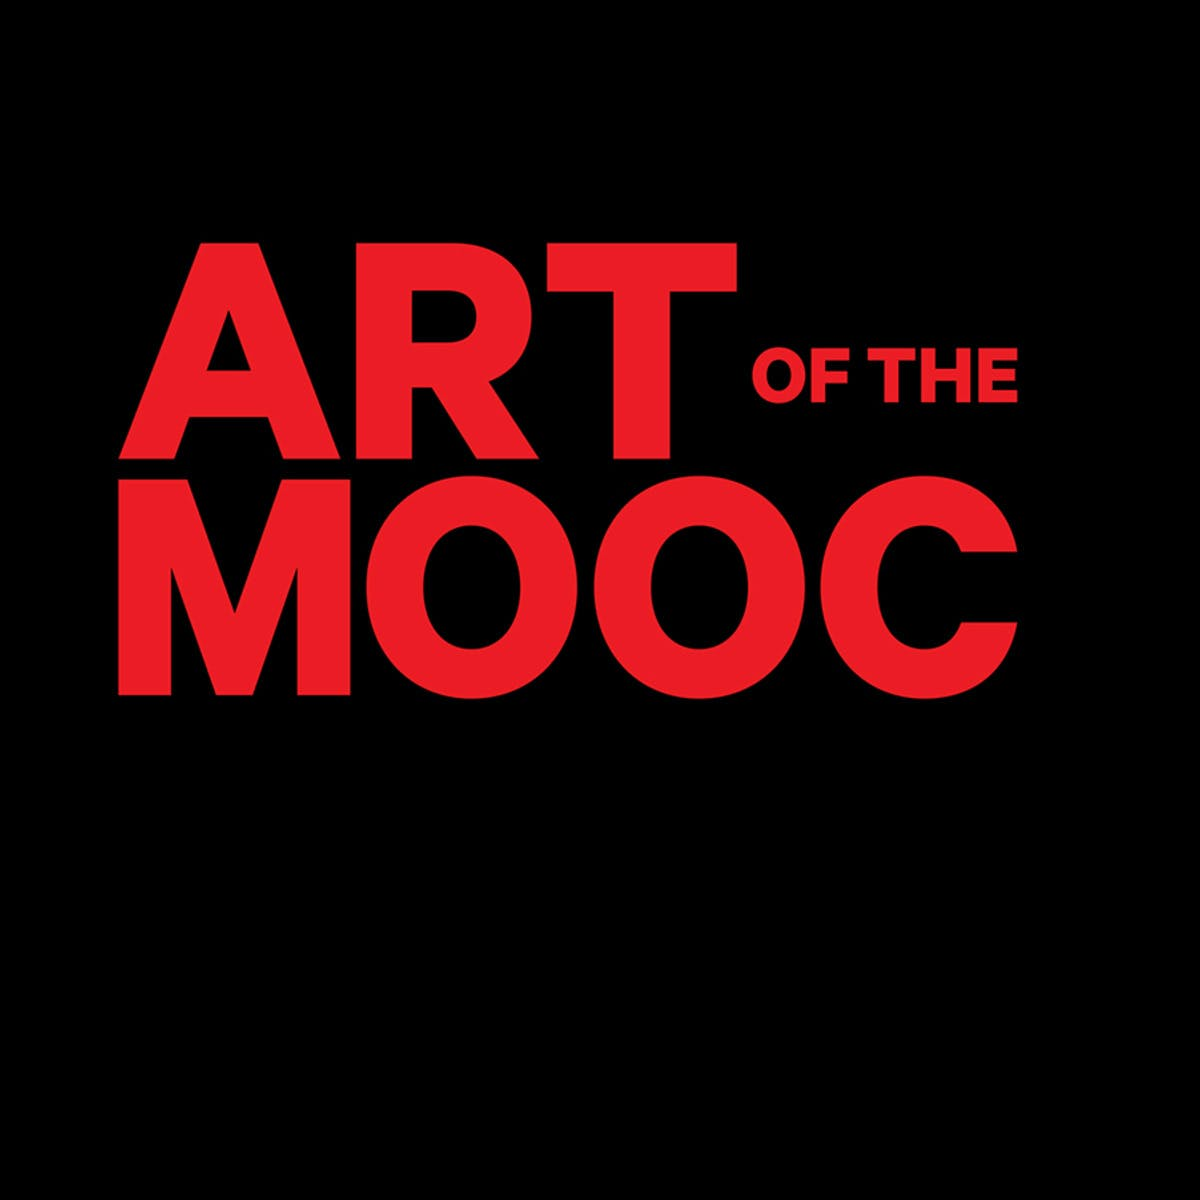 ART of the MOOC: Activism and Social Movements